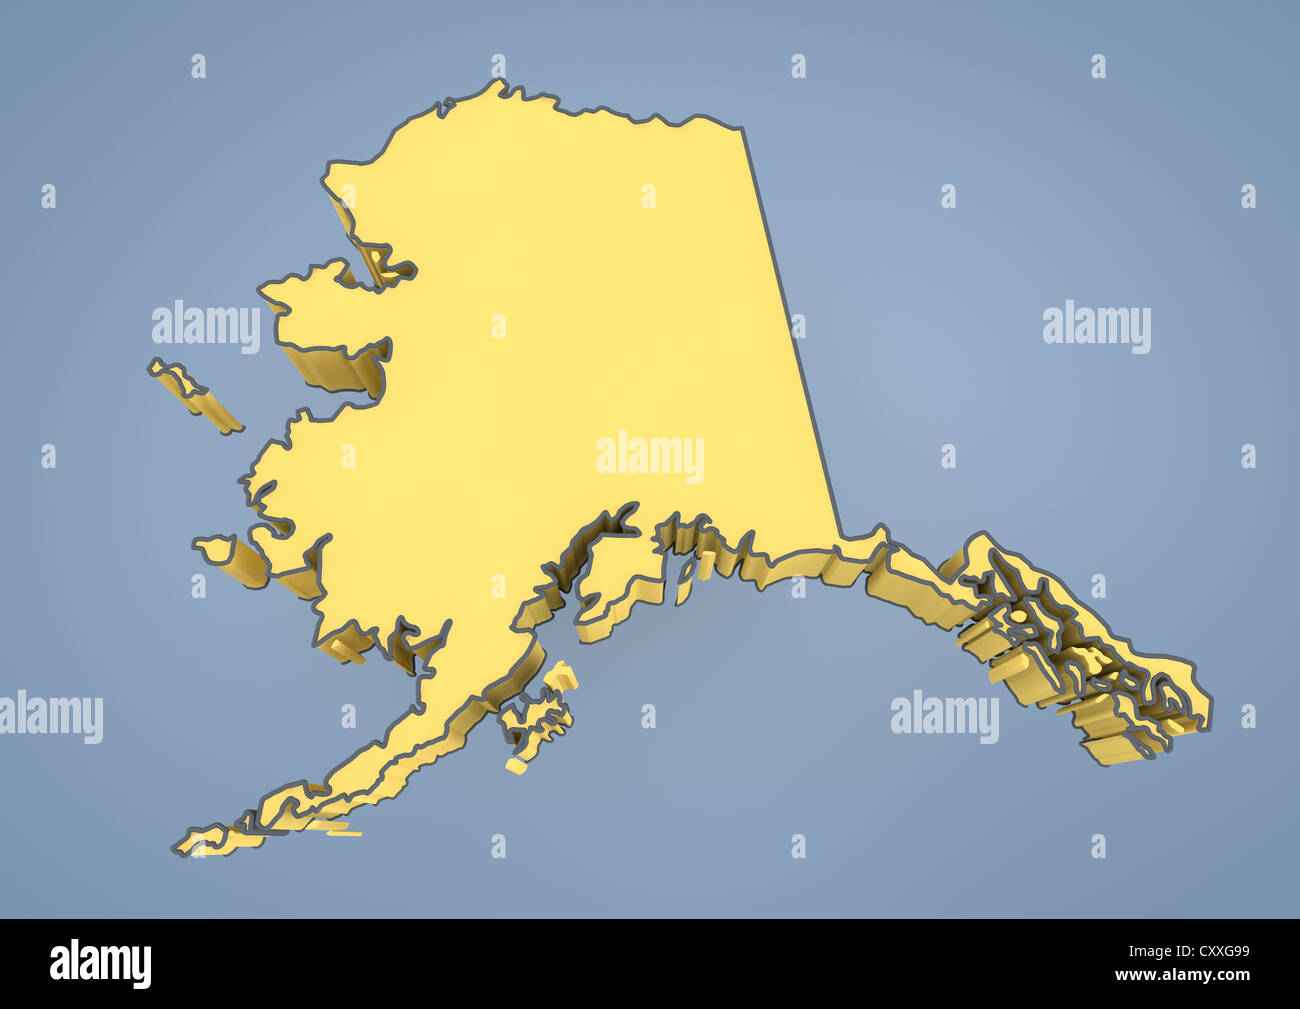 Map Of Alaska AK USA United States Of America Contour D - Alaska america map